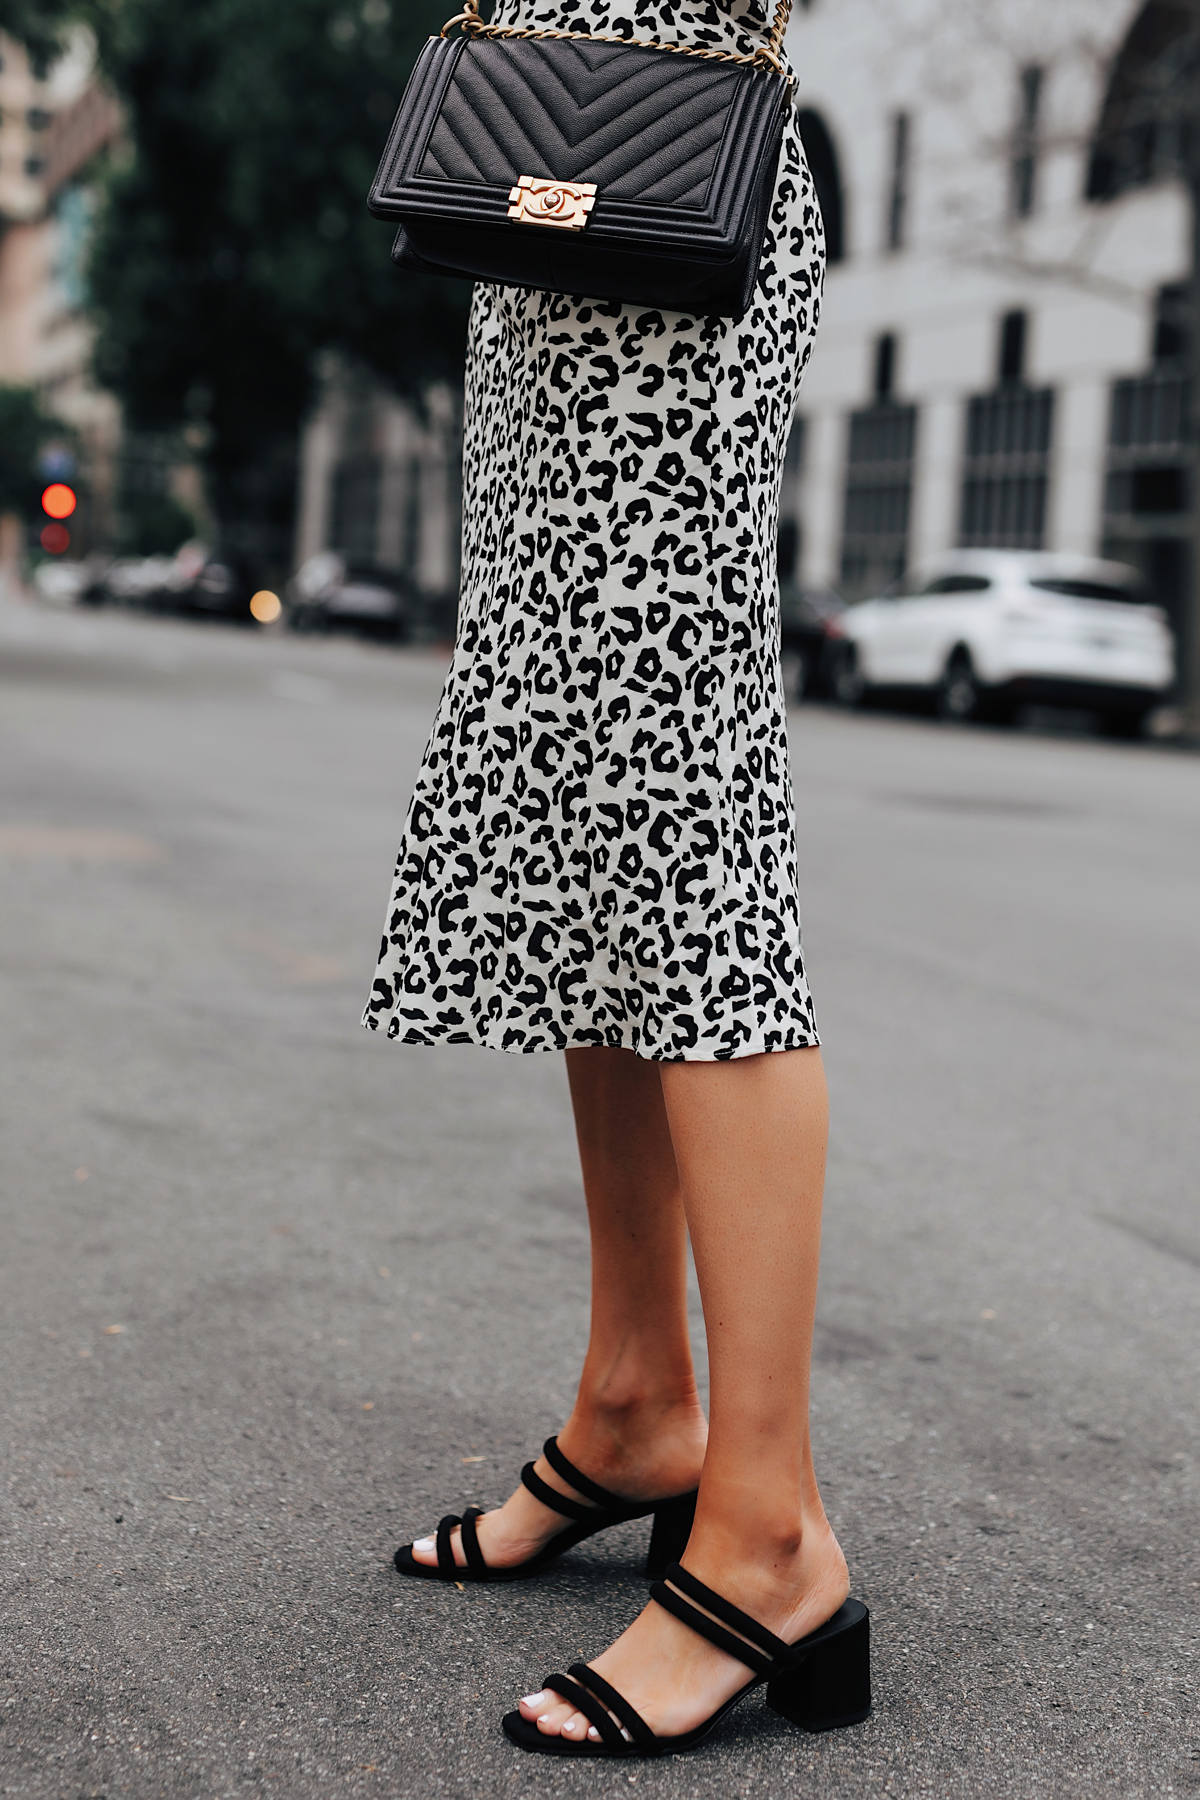 Fashion Jackson Wearing Leopard Midi Skirt Chanel Black Boy Bag Black Heeled Sandals